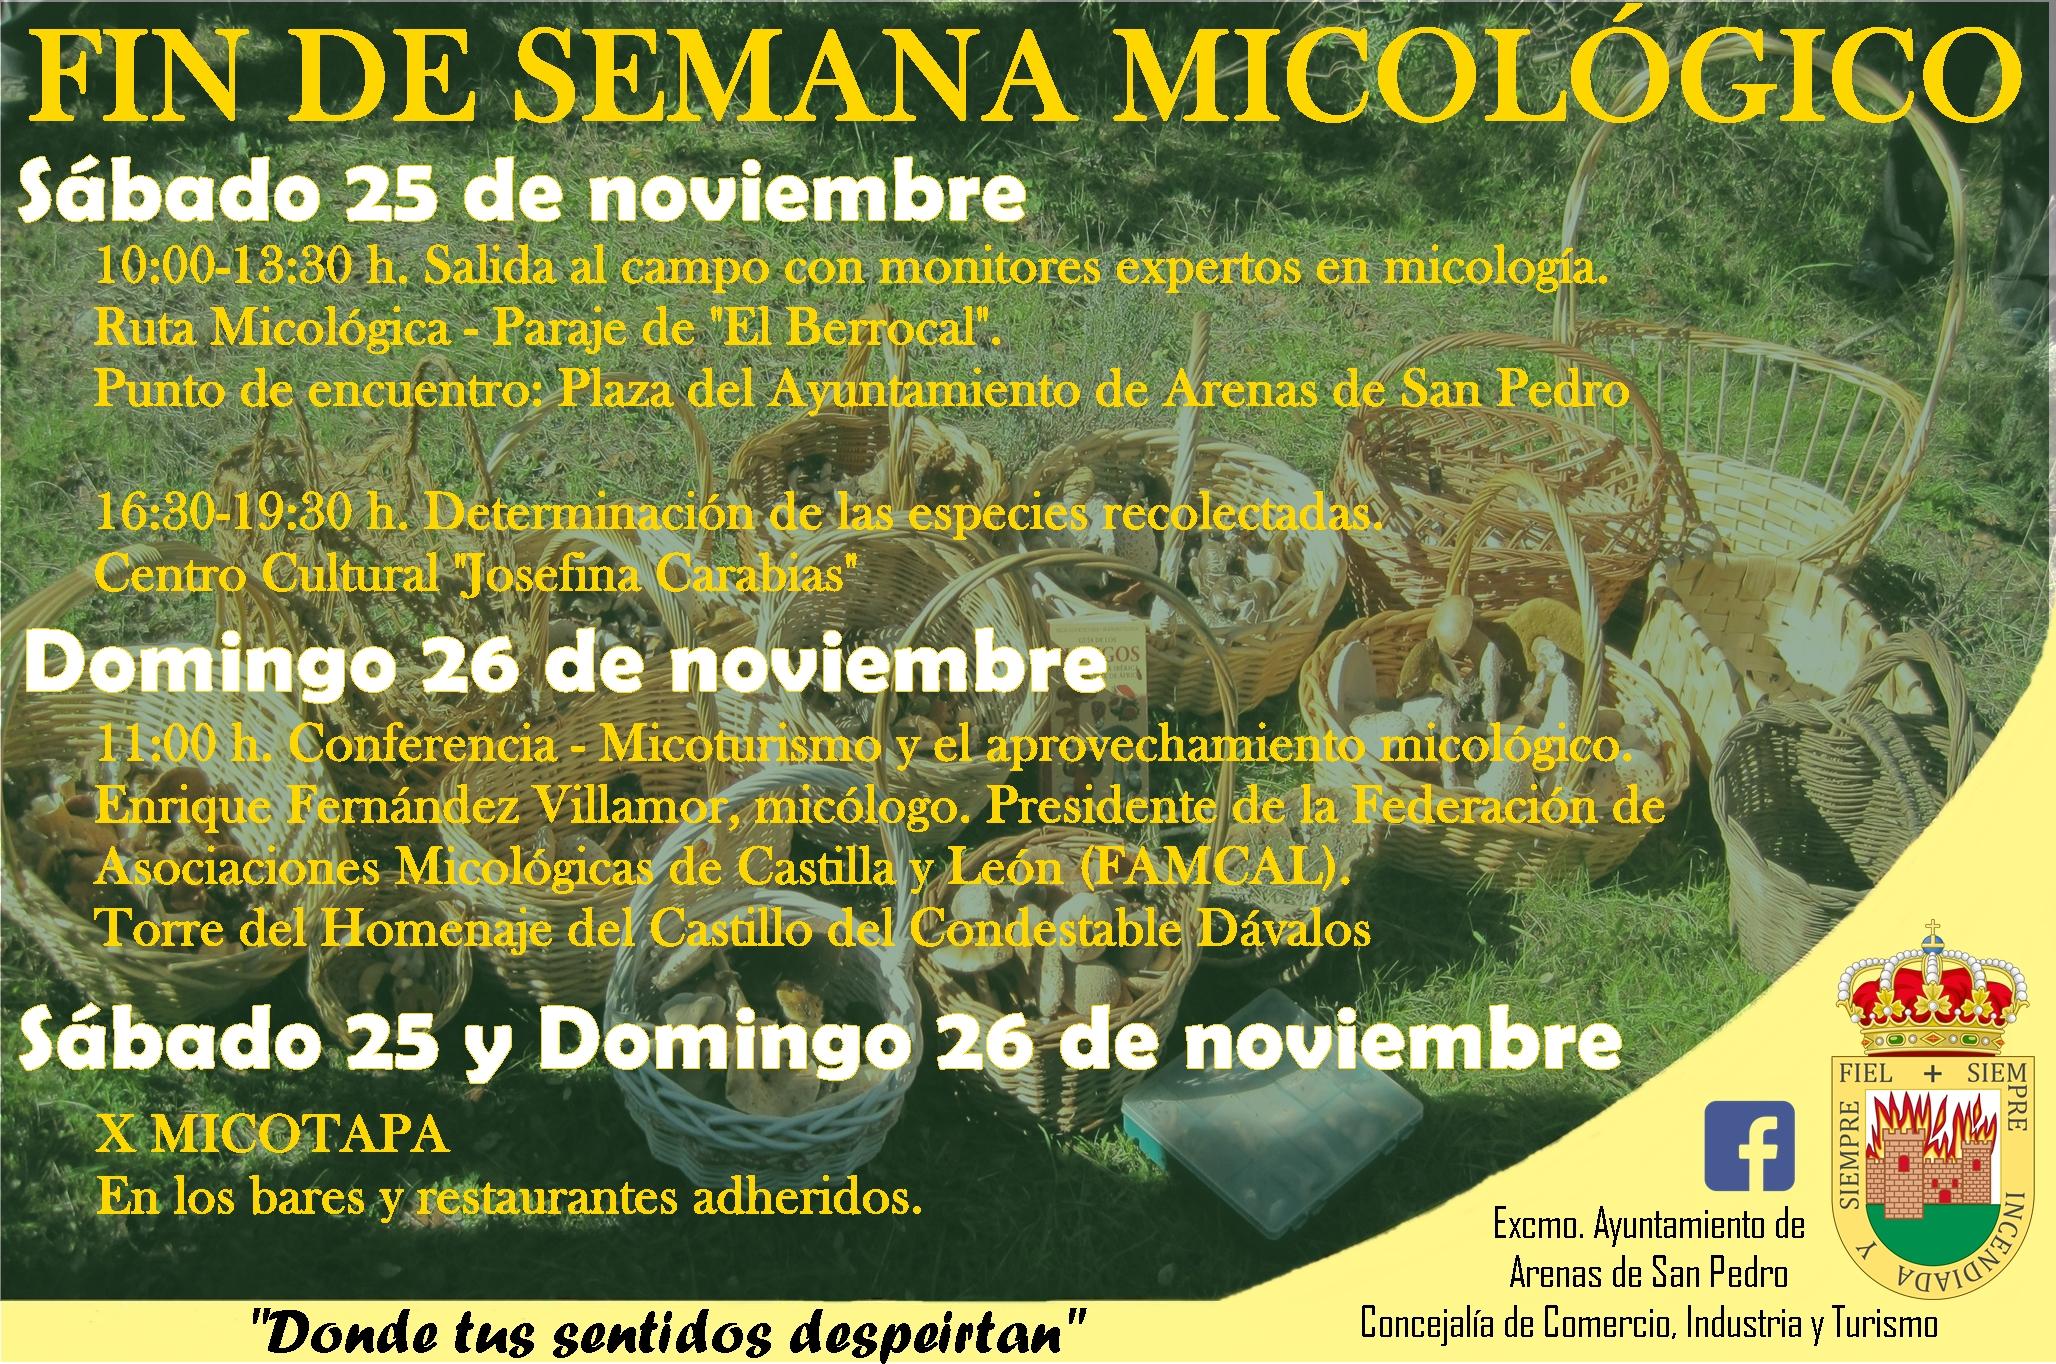 Jornadas Micologicas Arenas de San Pedro